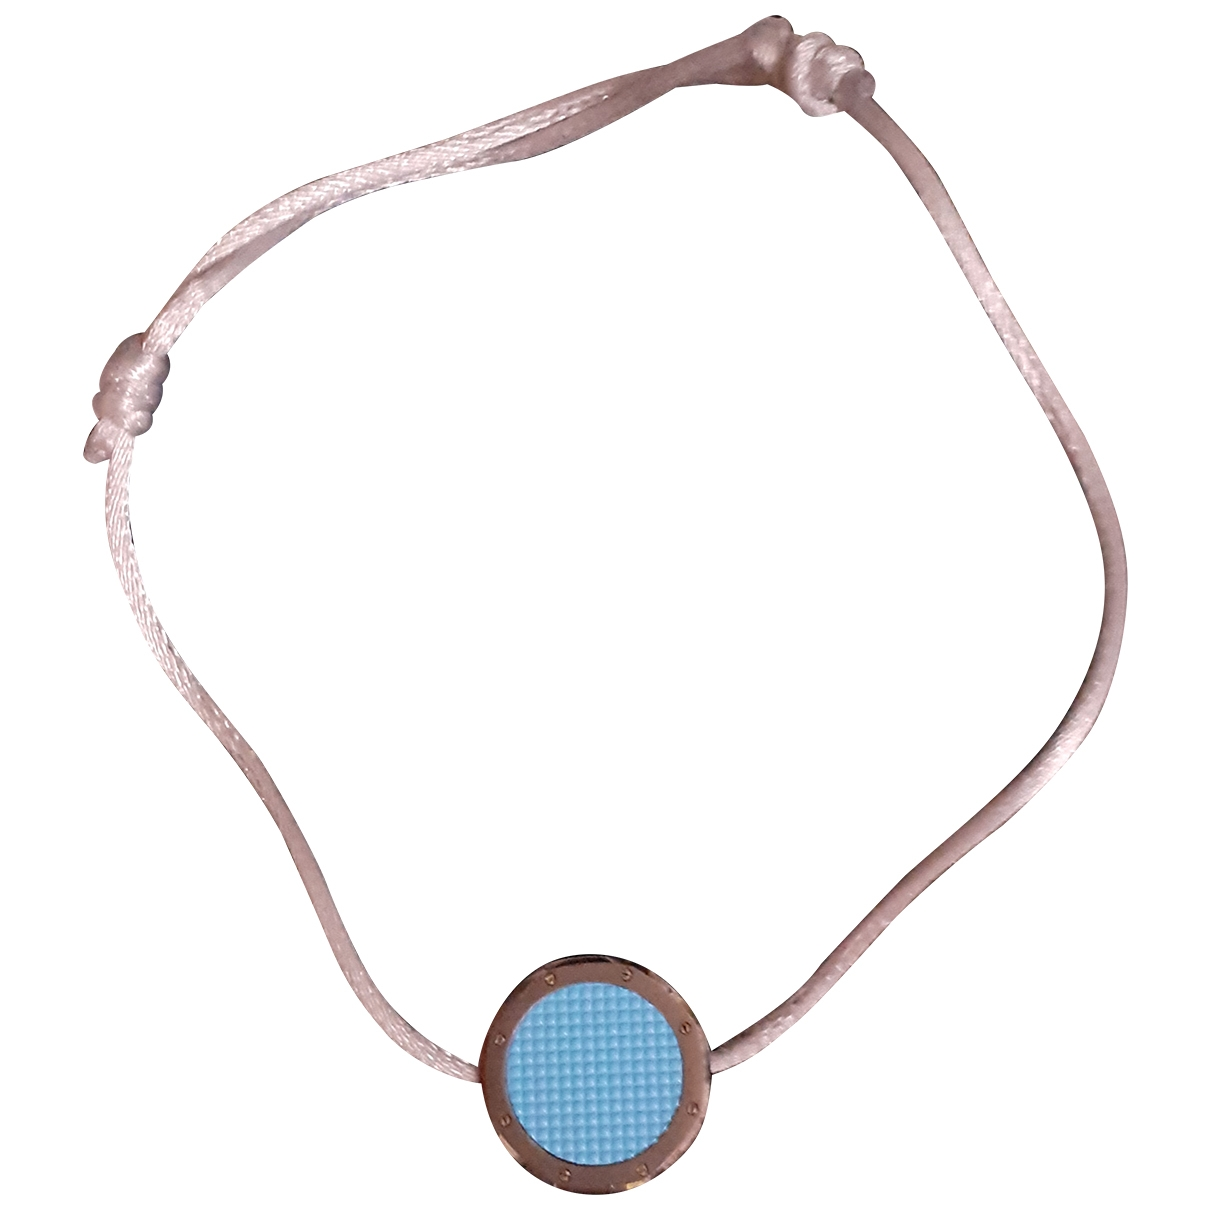 Audemars Piguet \N Armband in  Grau Stahl